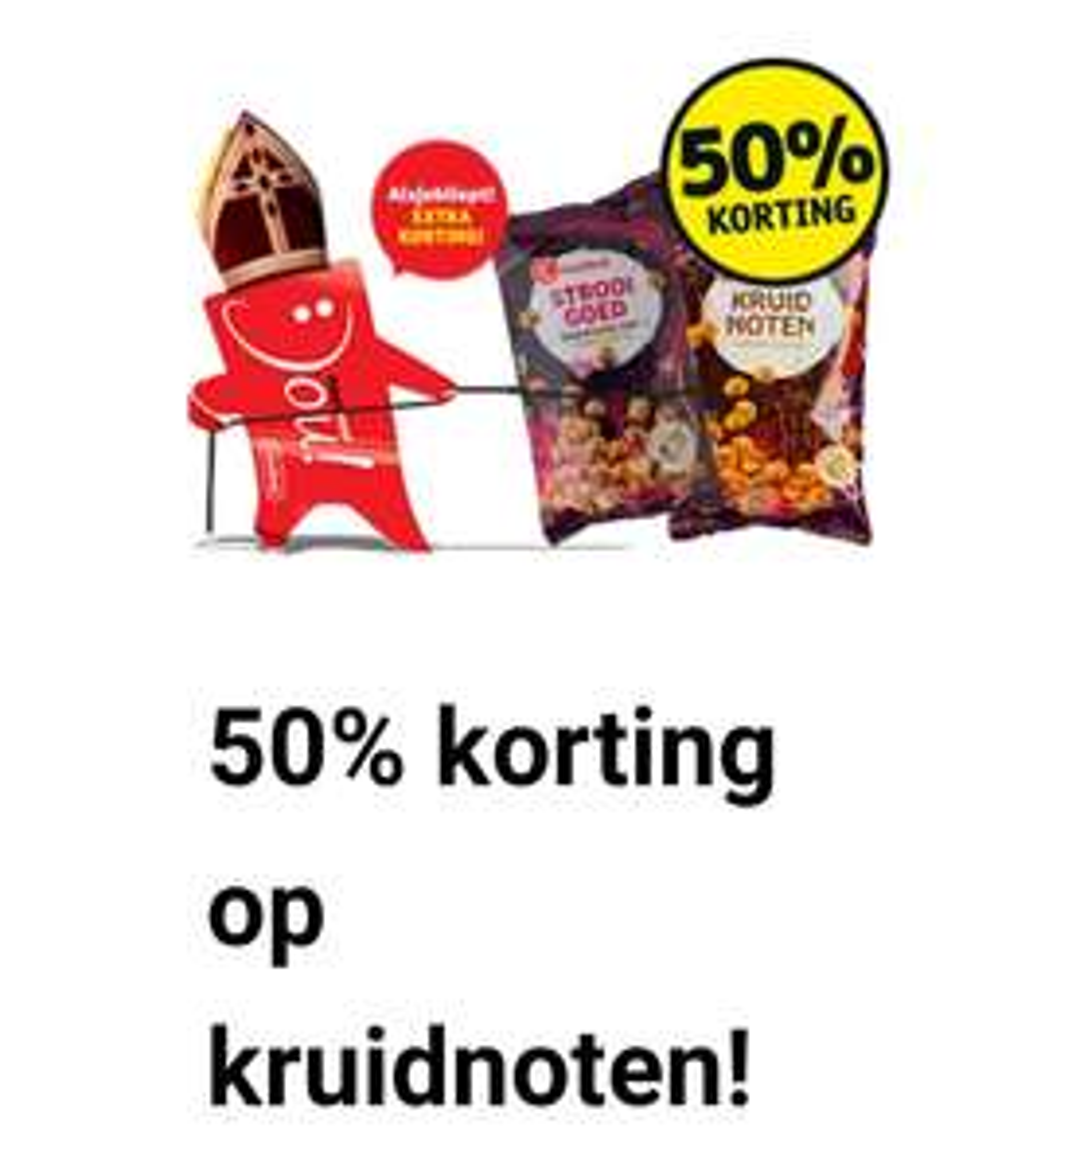 Kruidnoten-uitdeelzakjes 50% korting bij Kruidvat